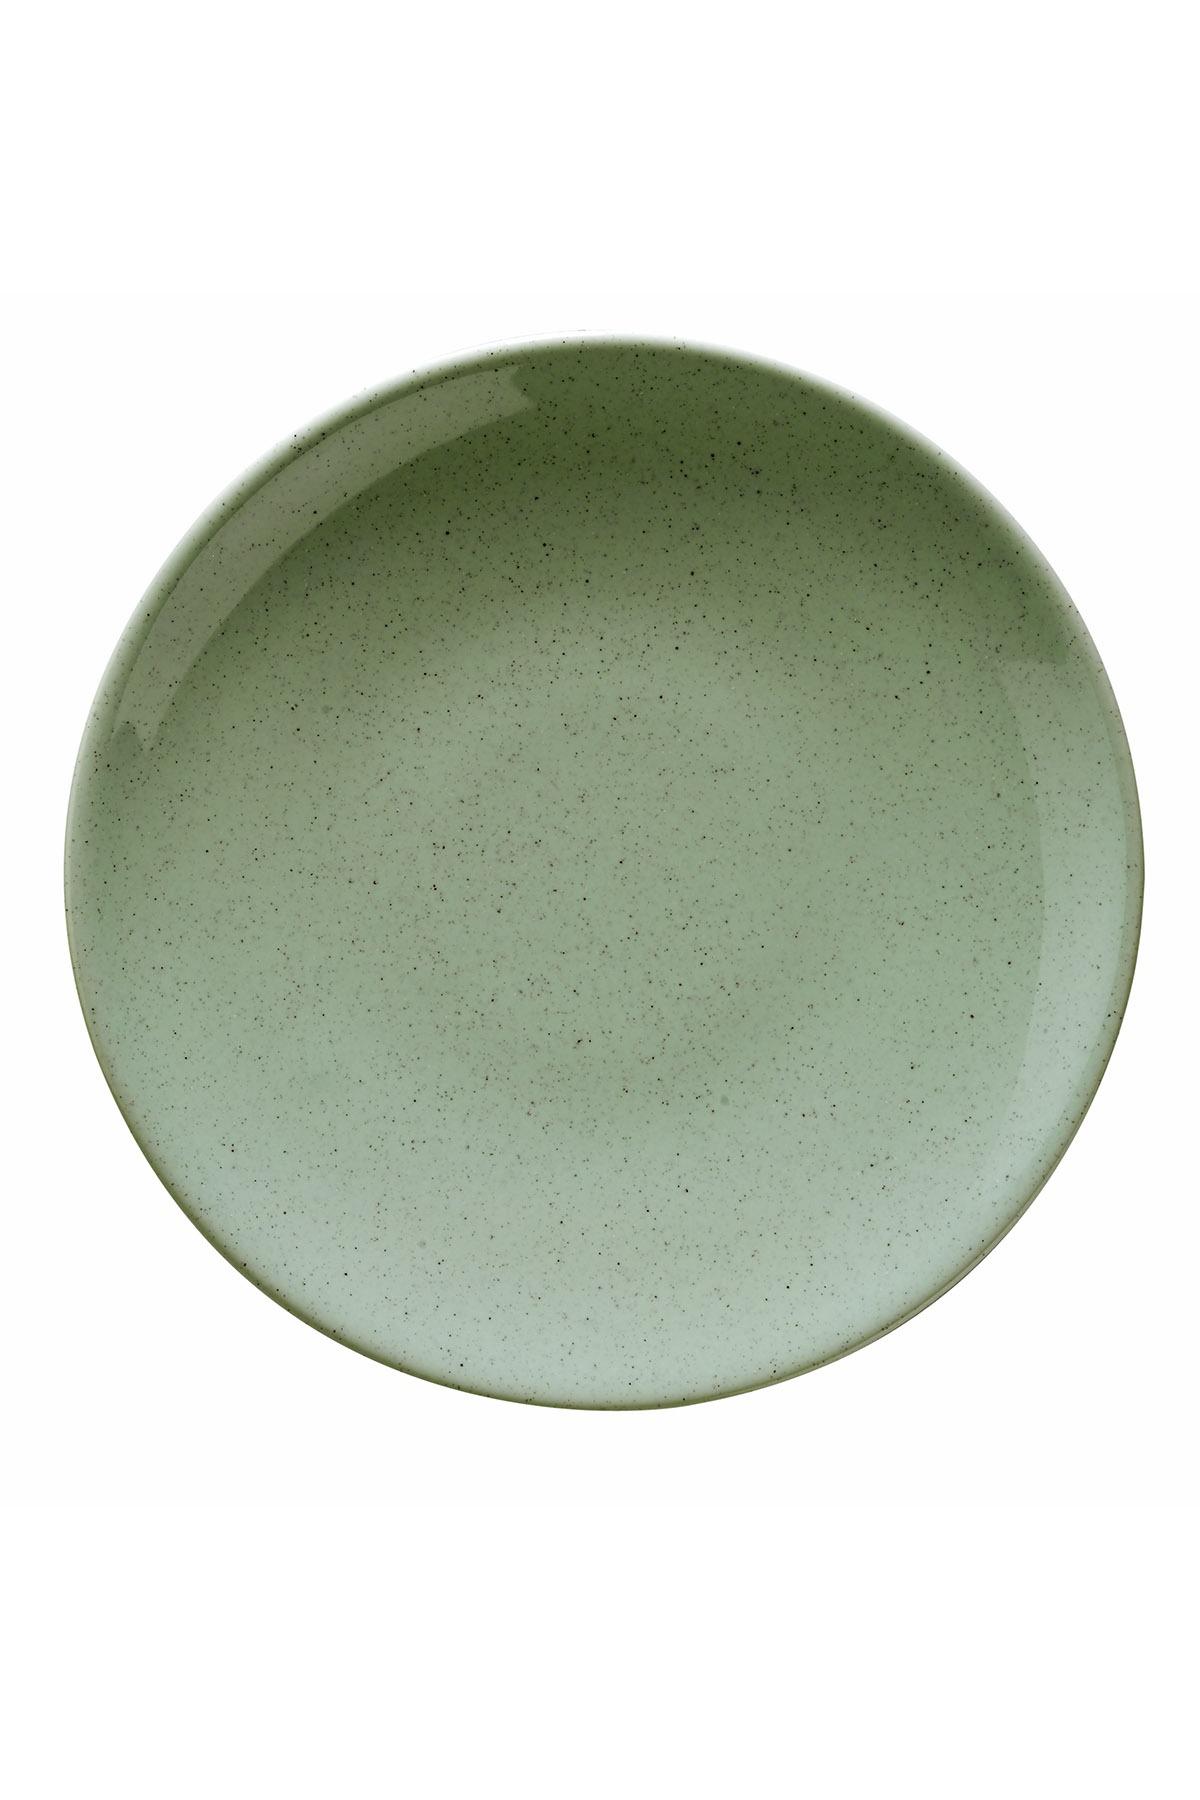 Naturaceram Harlek Granül 24 Parça Yeşil Yemek Seti